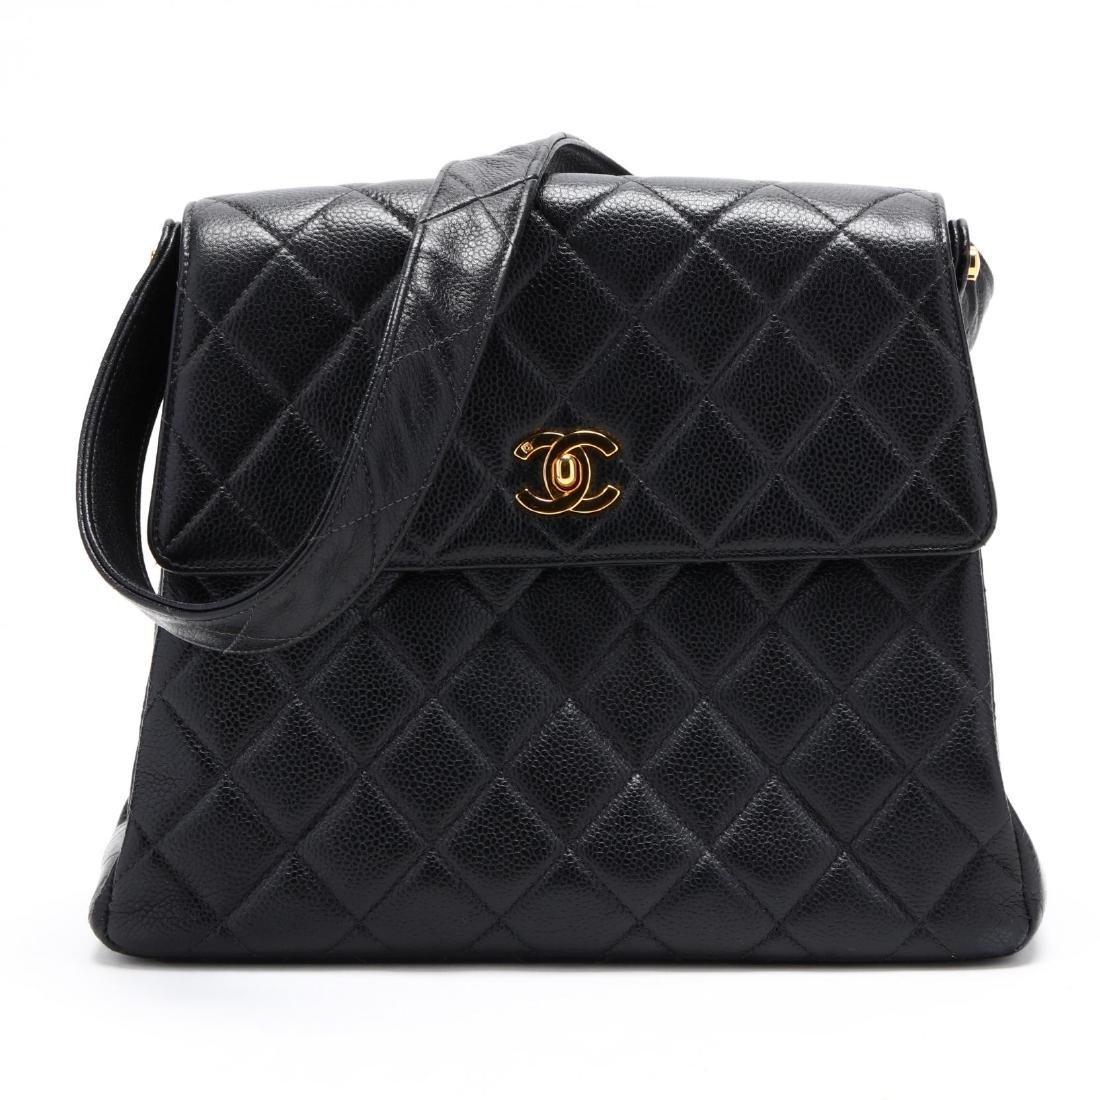 Caviar Leather Trapeze Flap Handbag, Chanel